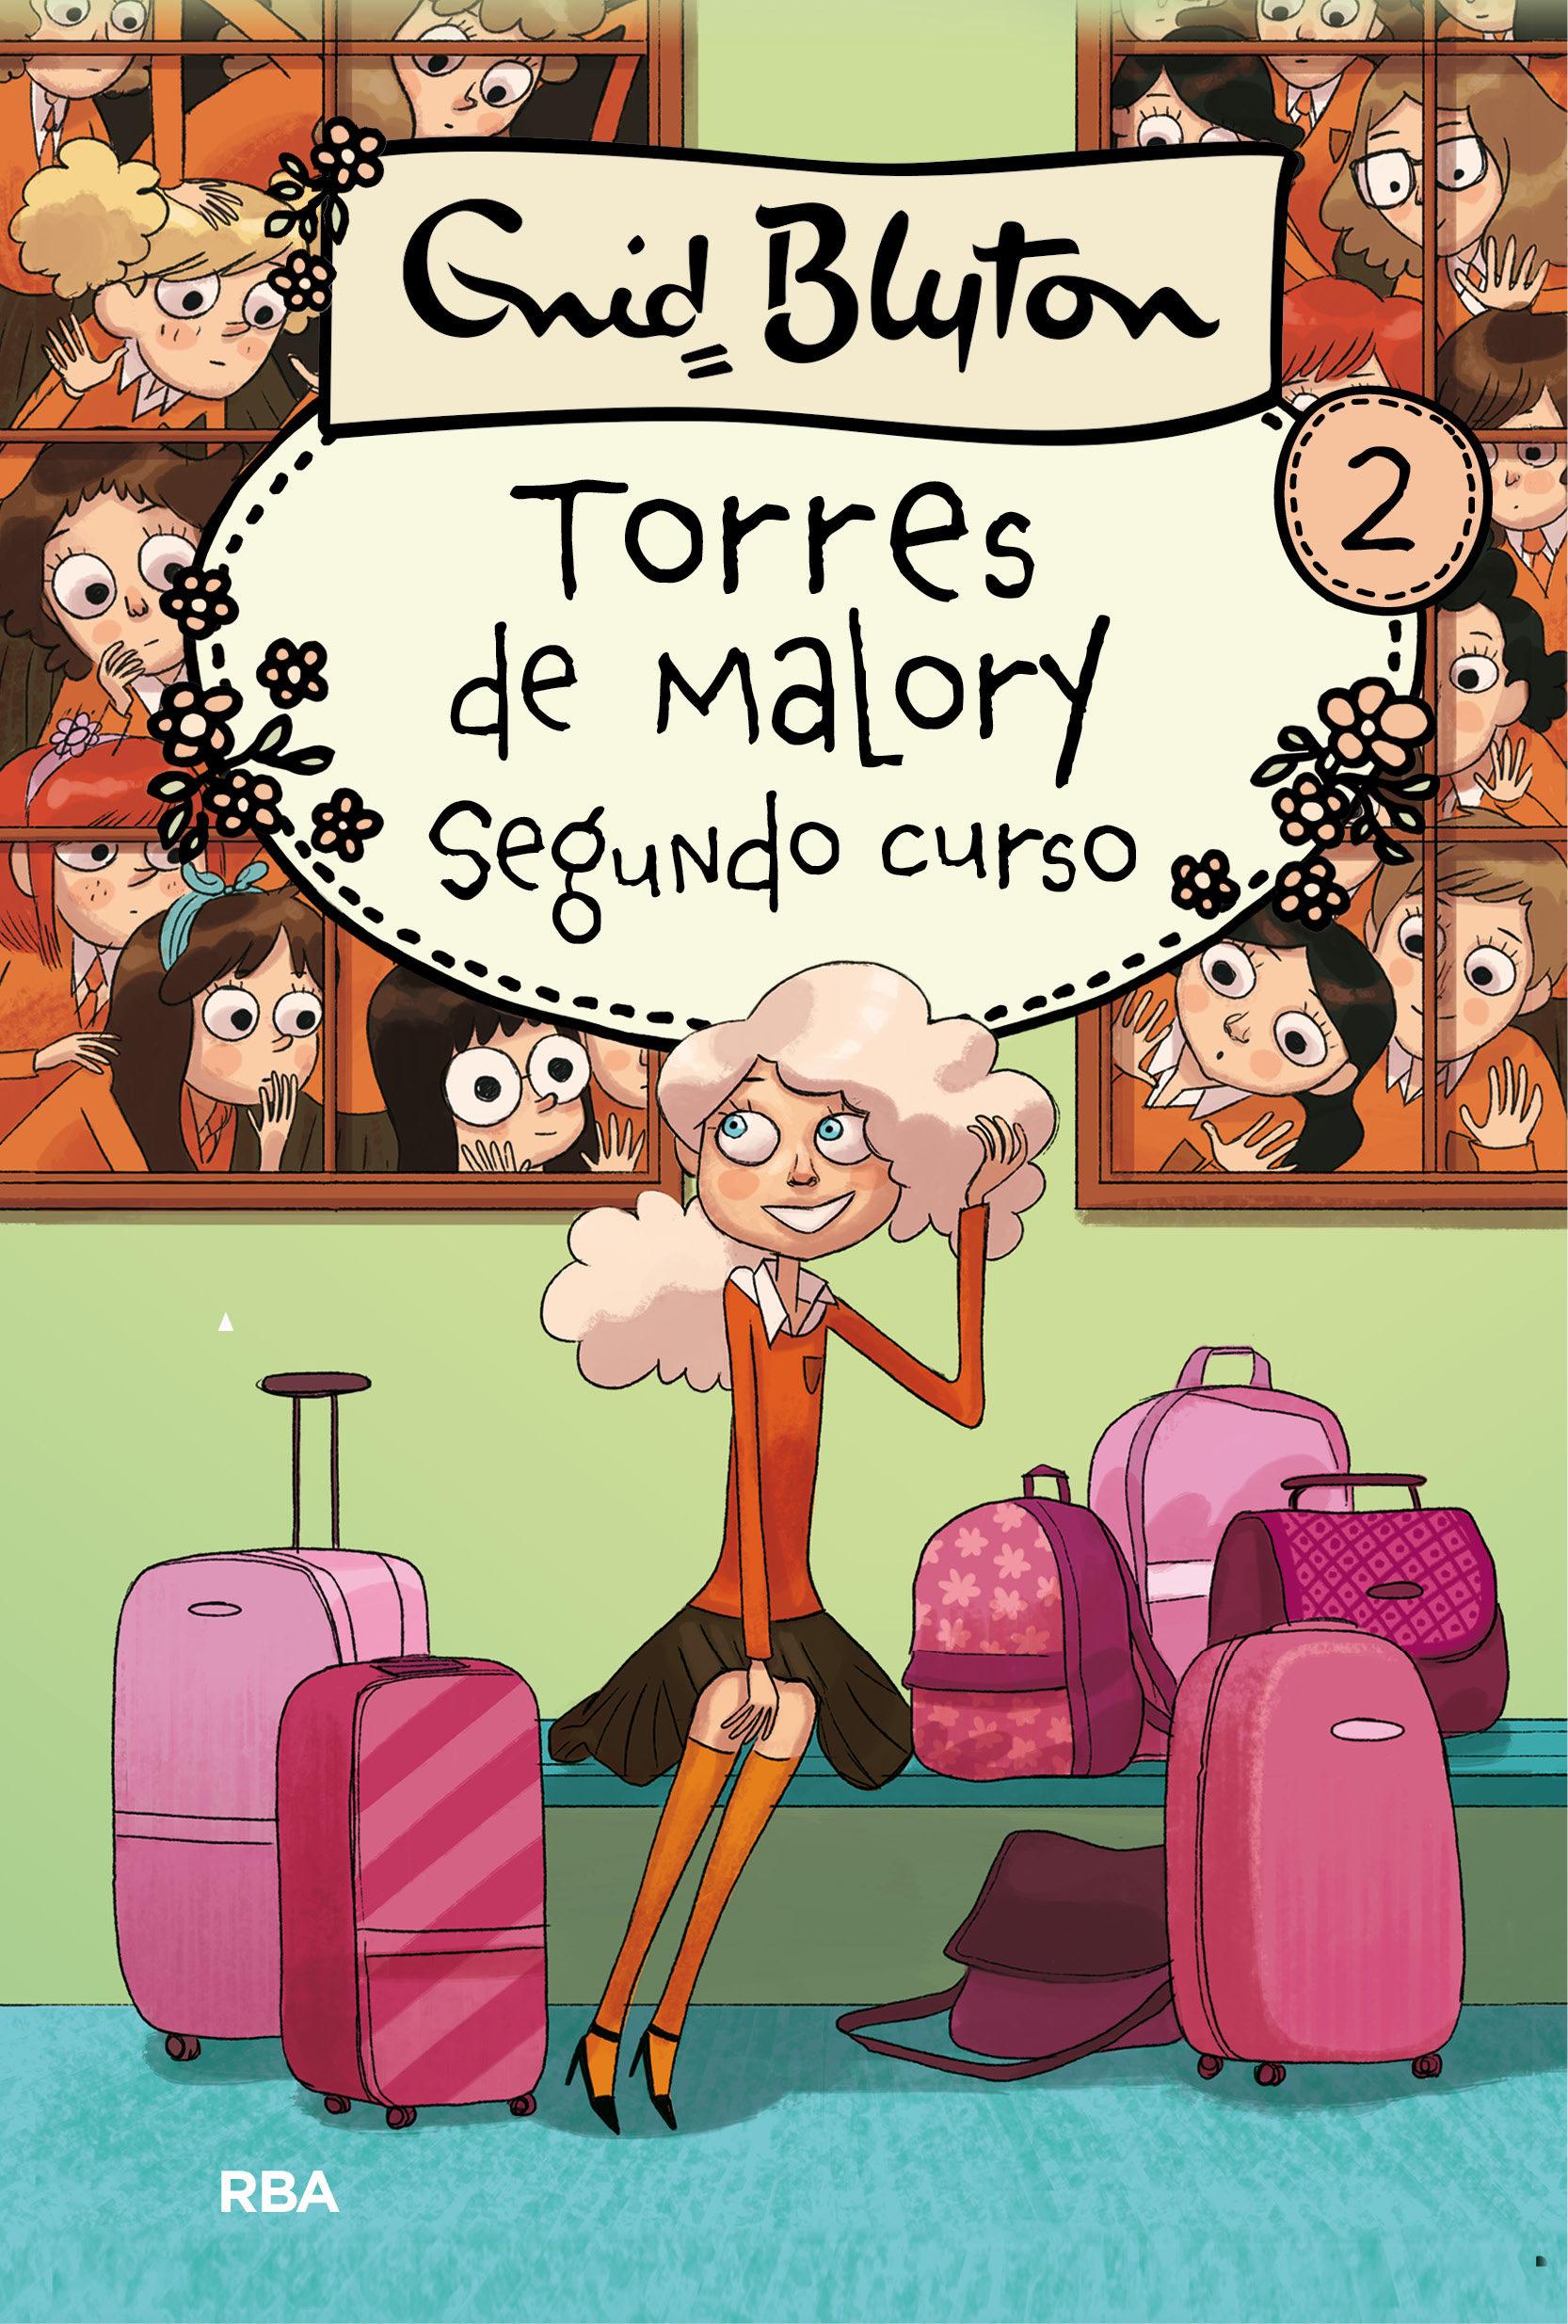 SEGUNDO GRADO EN TORRES DE MALORY